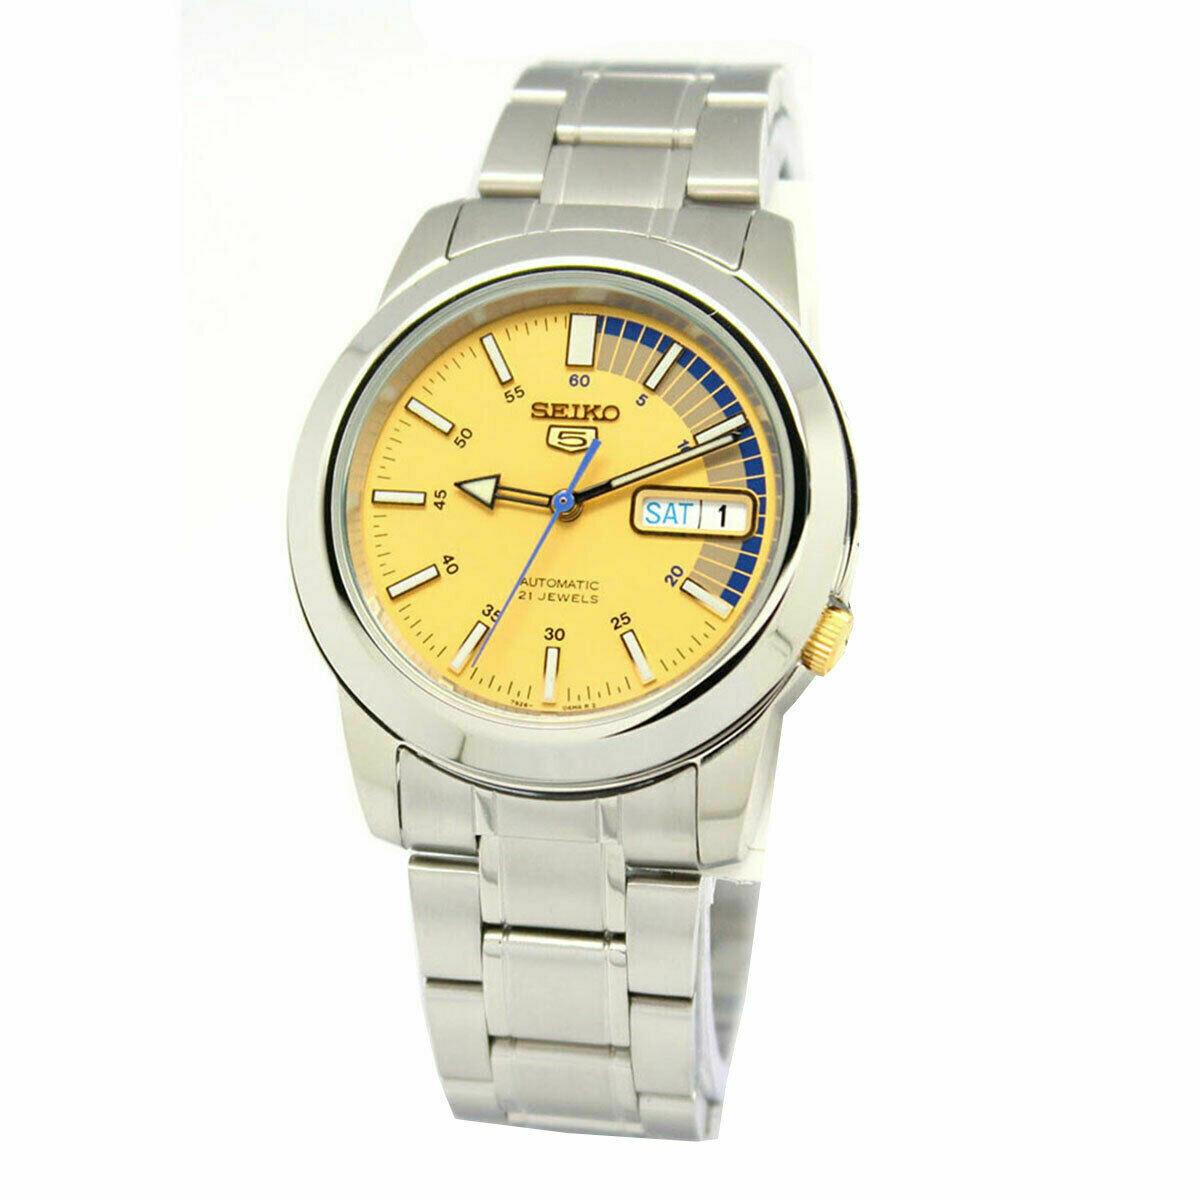 Reloj Automático Hombre Seiko 5 SNKK29K1 dial dorado correa acero